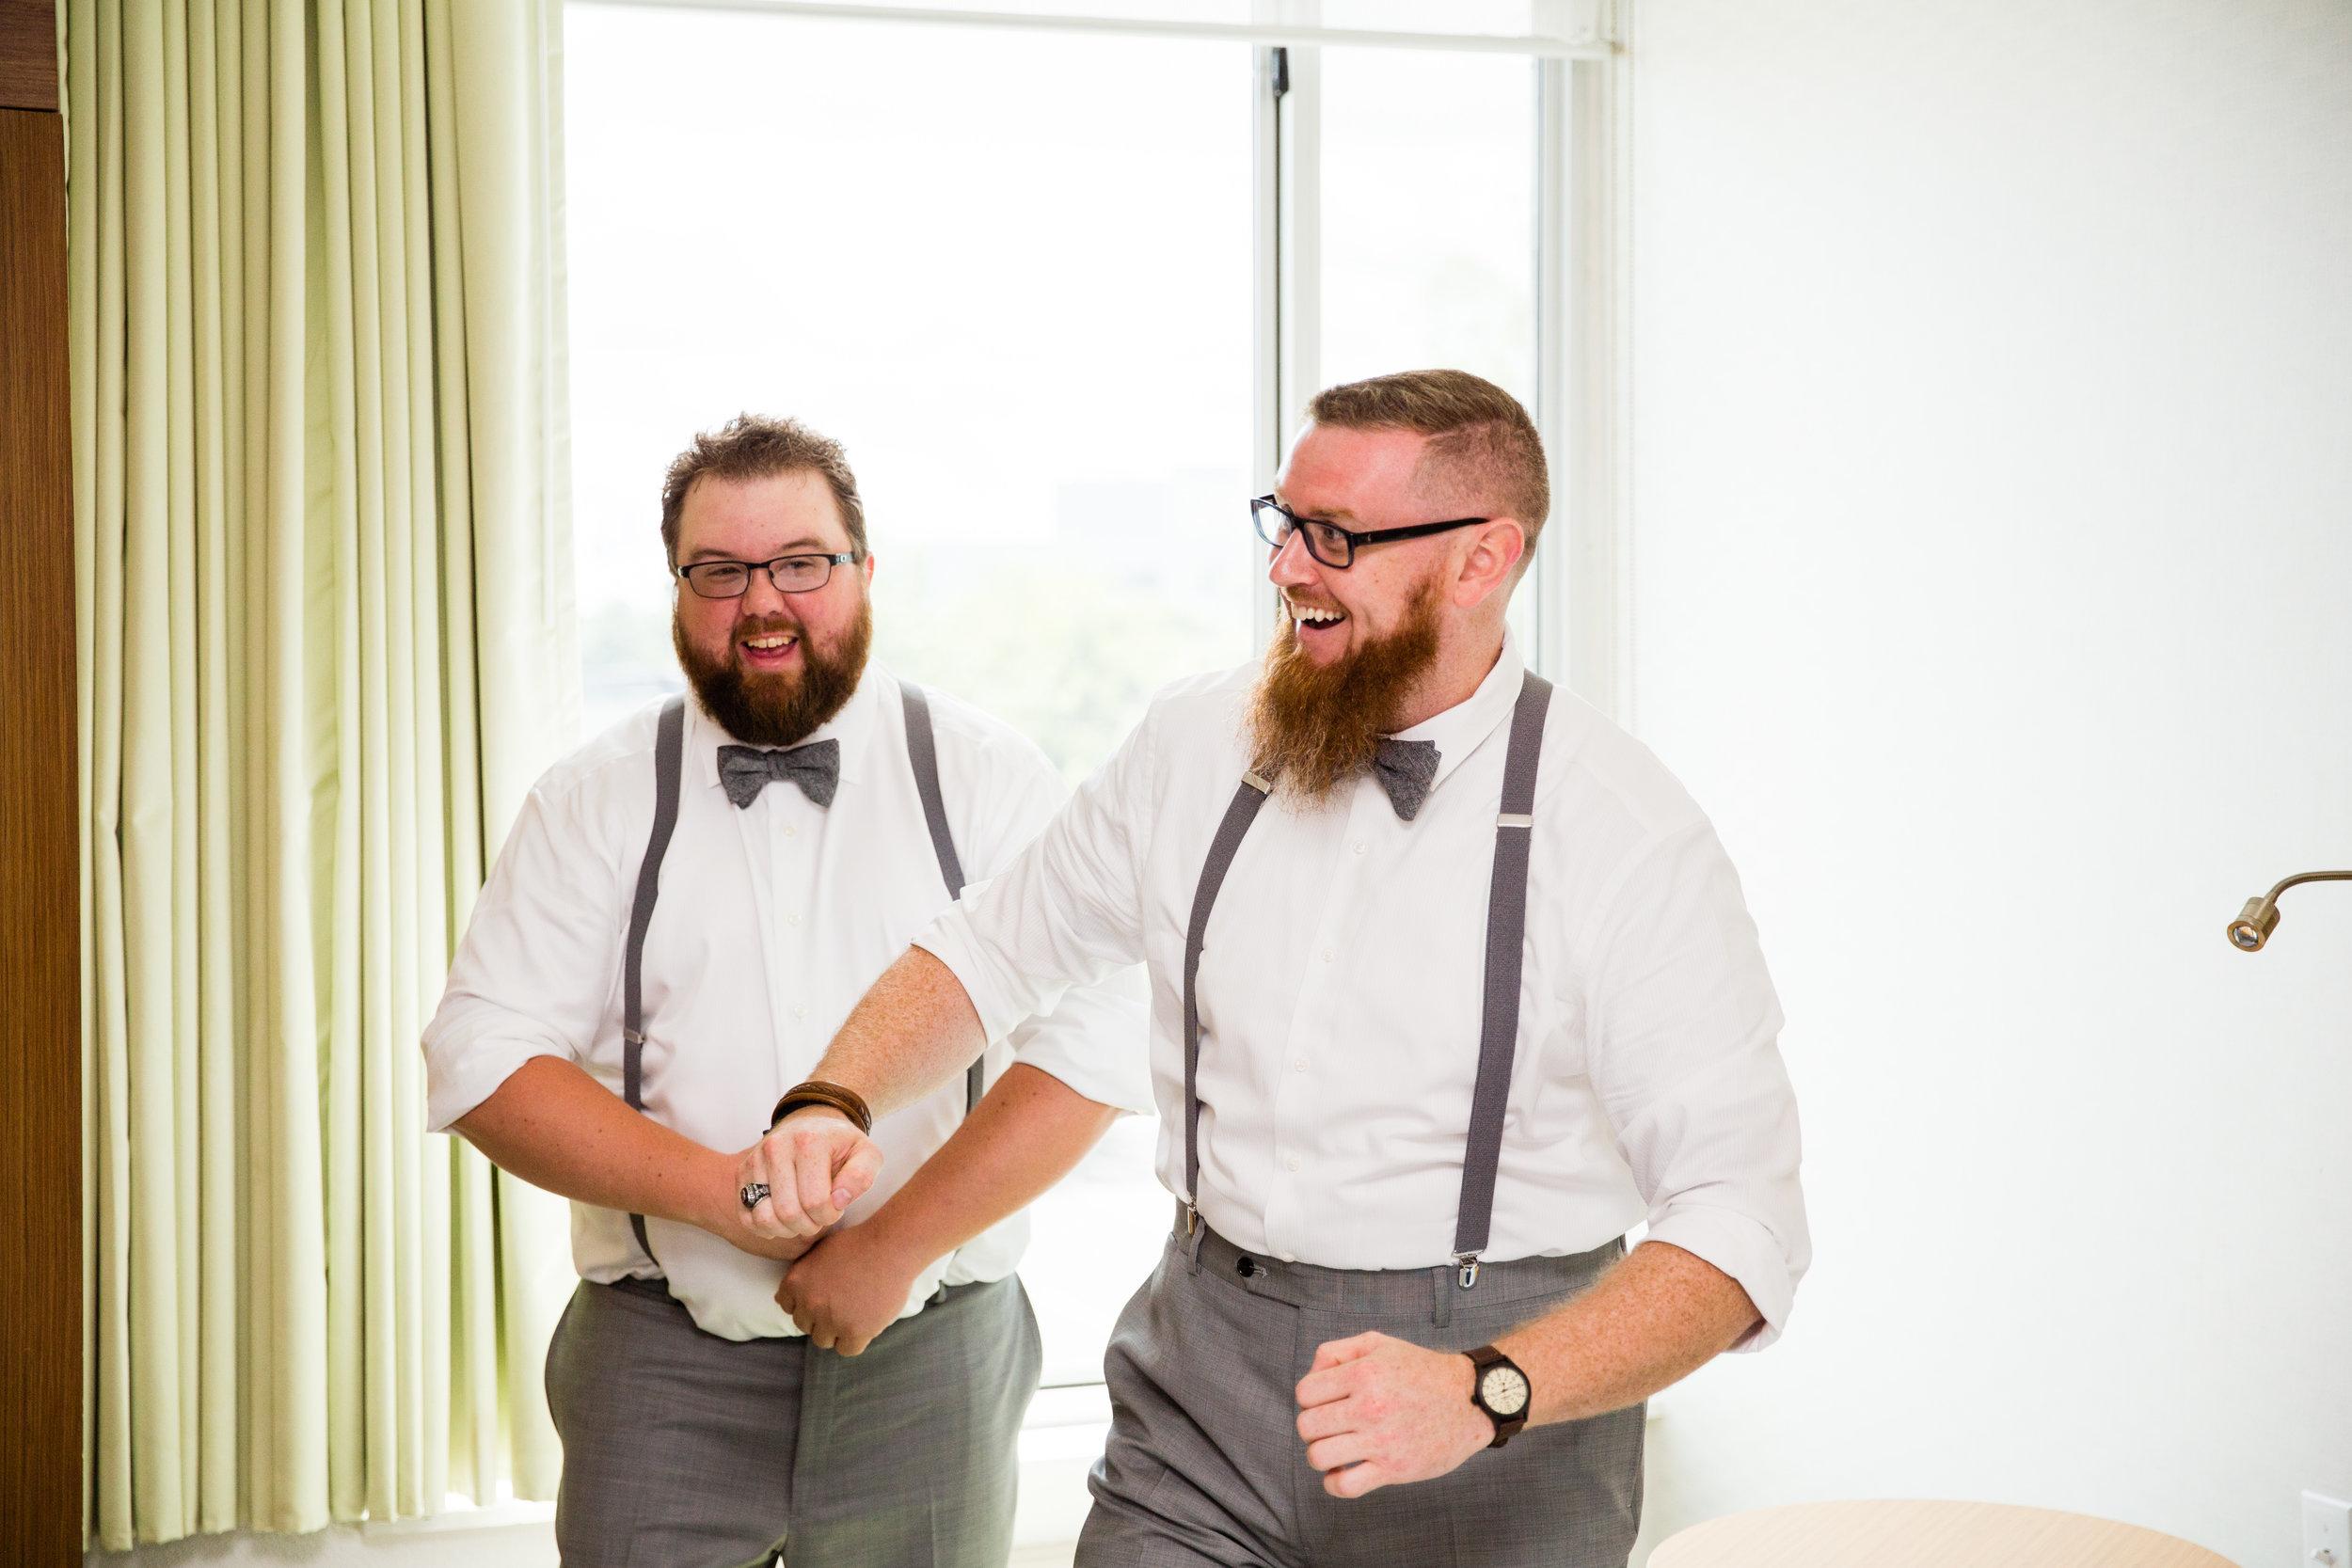 TYLER ARBORETUM WEDDING PHOTOGRAPHY LOVESTRUCK PICTURES-003.jpg